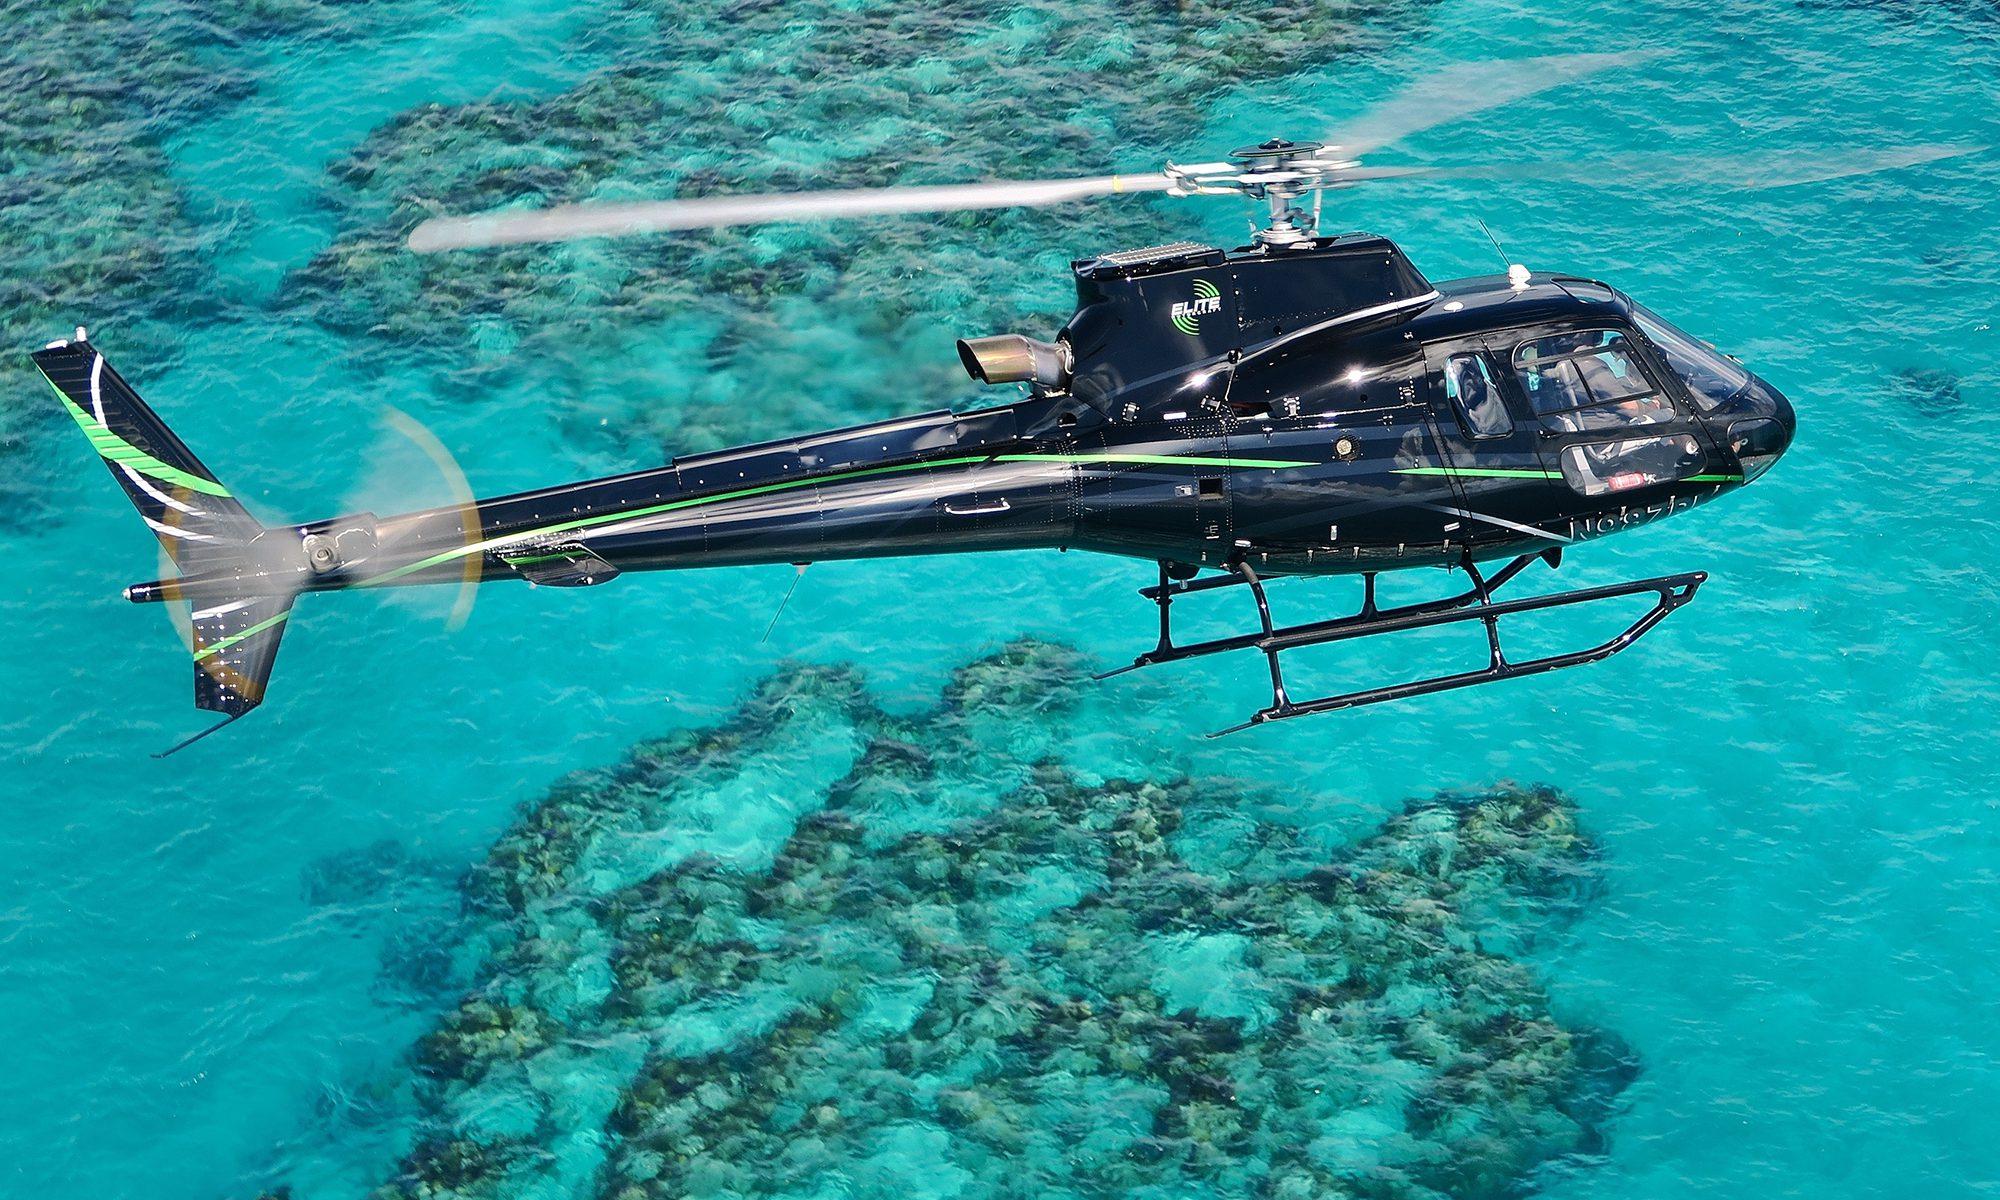 Heli-Lynx Helicopters